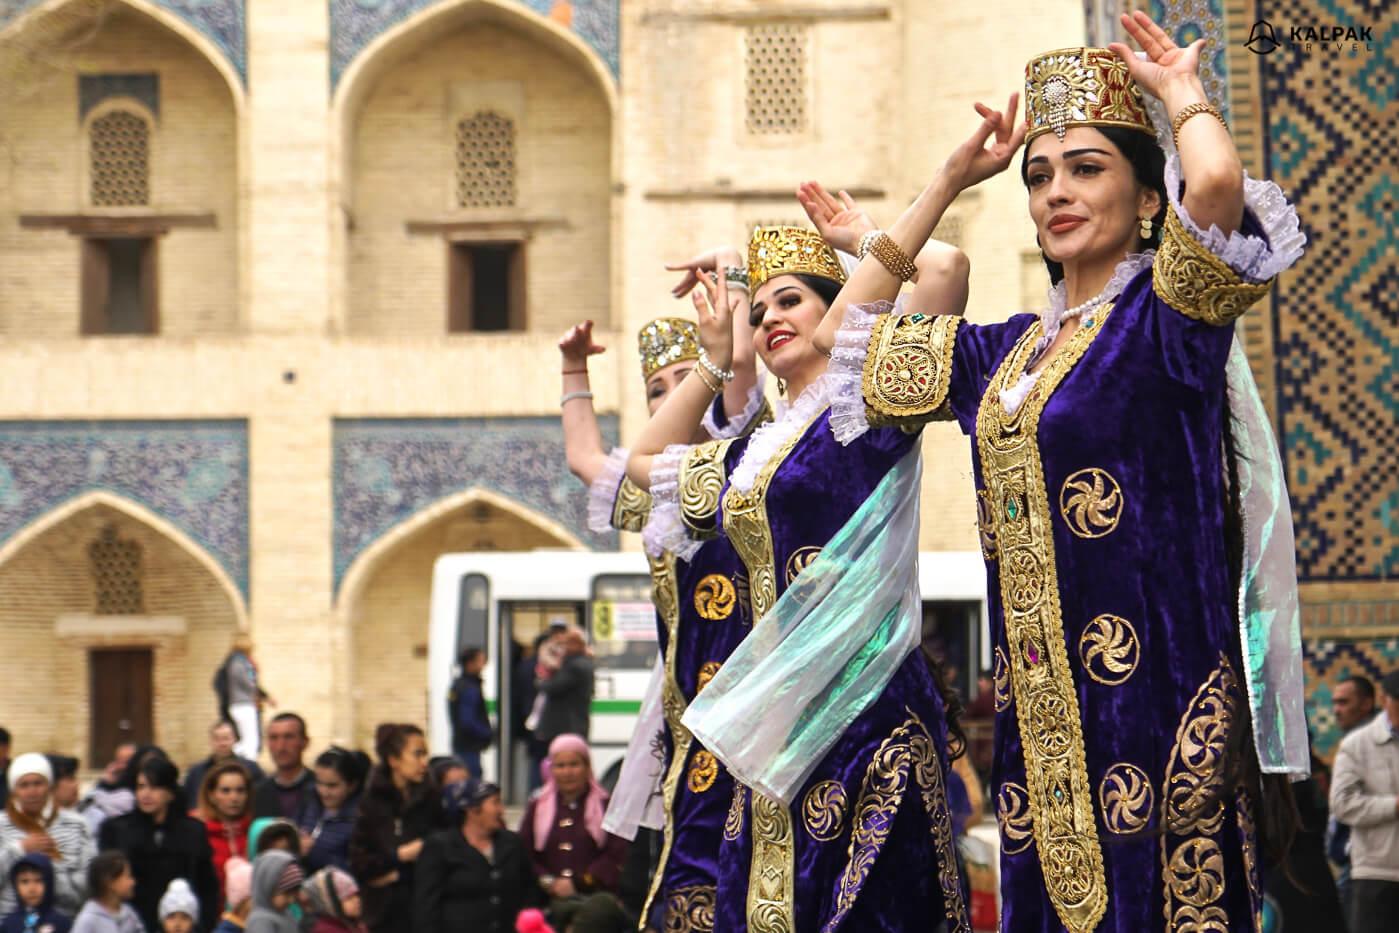 Bukhara dancers in Uzbek clothing